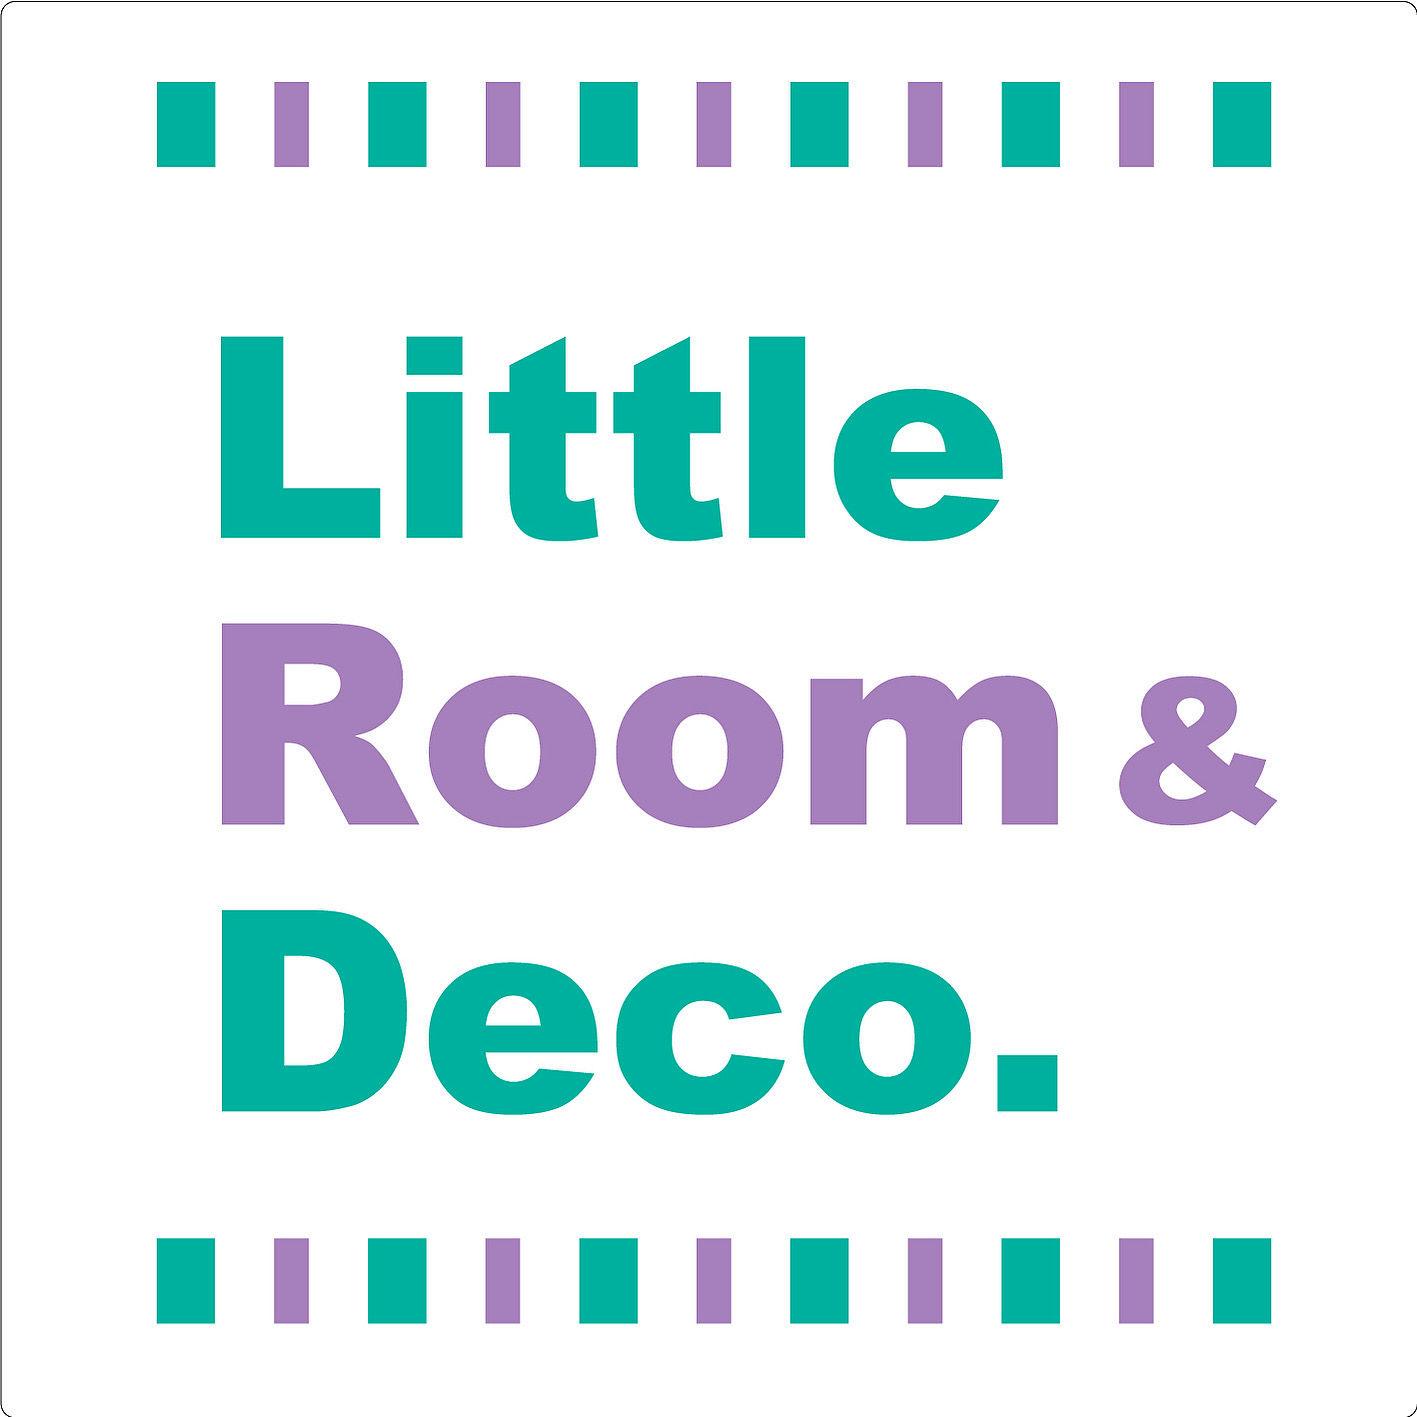 NUTTY LittleRoom&deco.